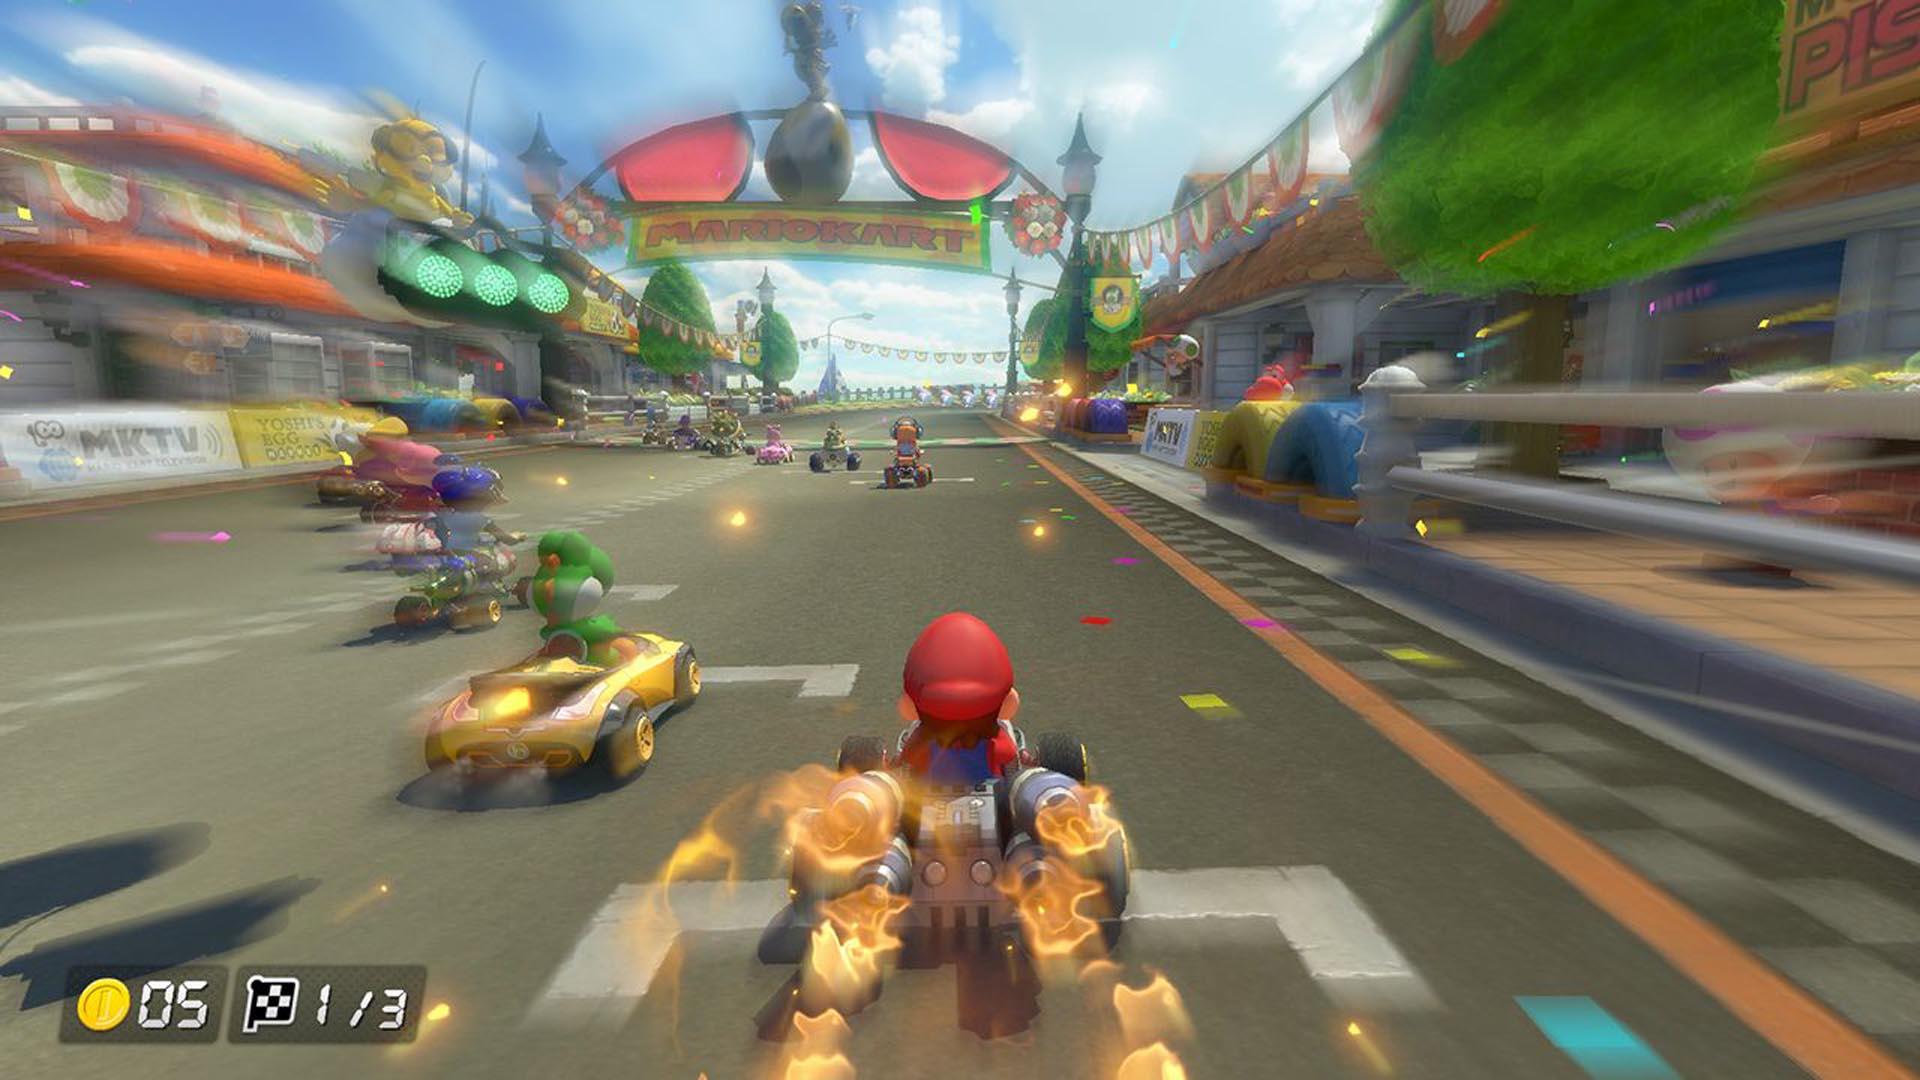 1_NintendoSwitch_MarioKart8_PlayStylet_MarioKart_Presentation2017_scrn26